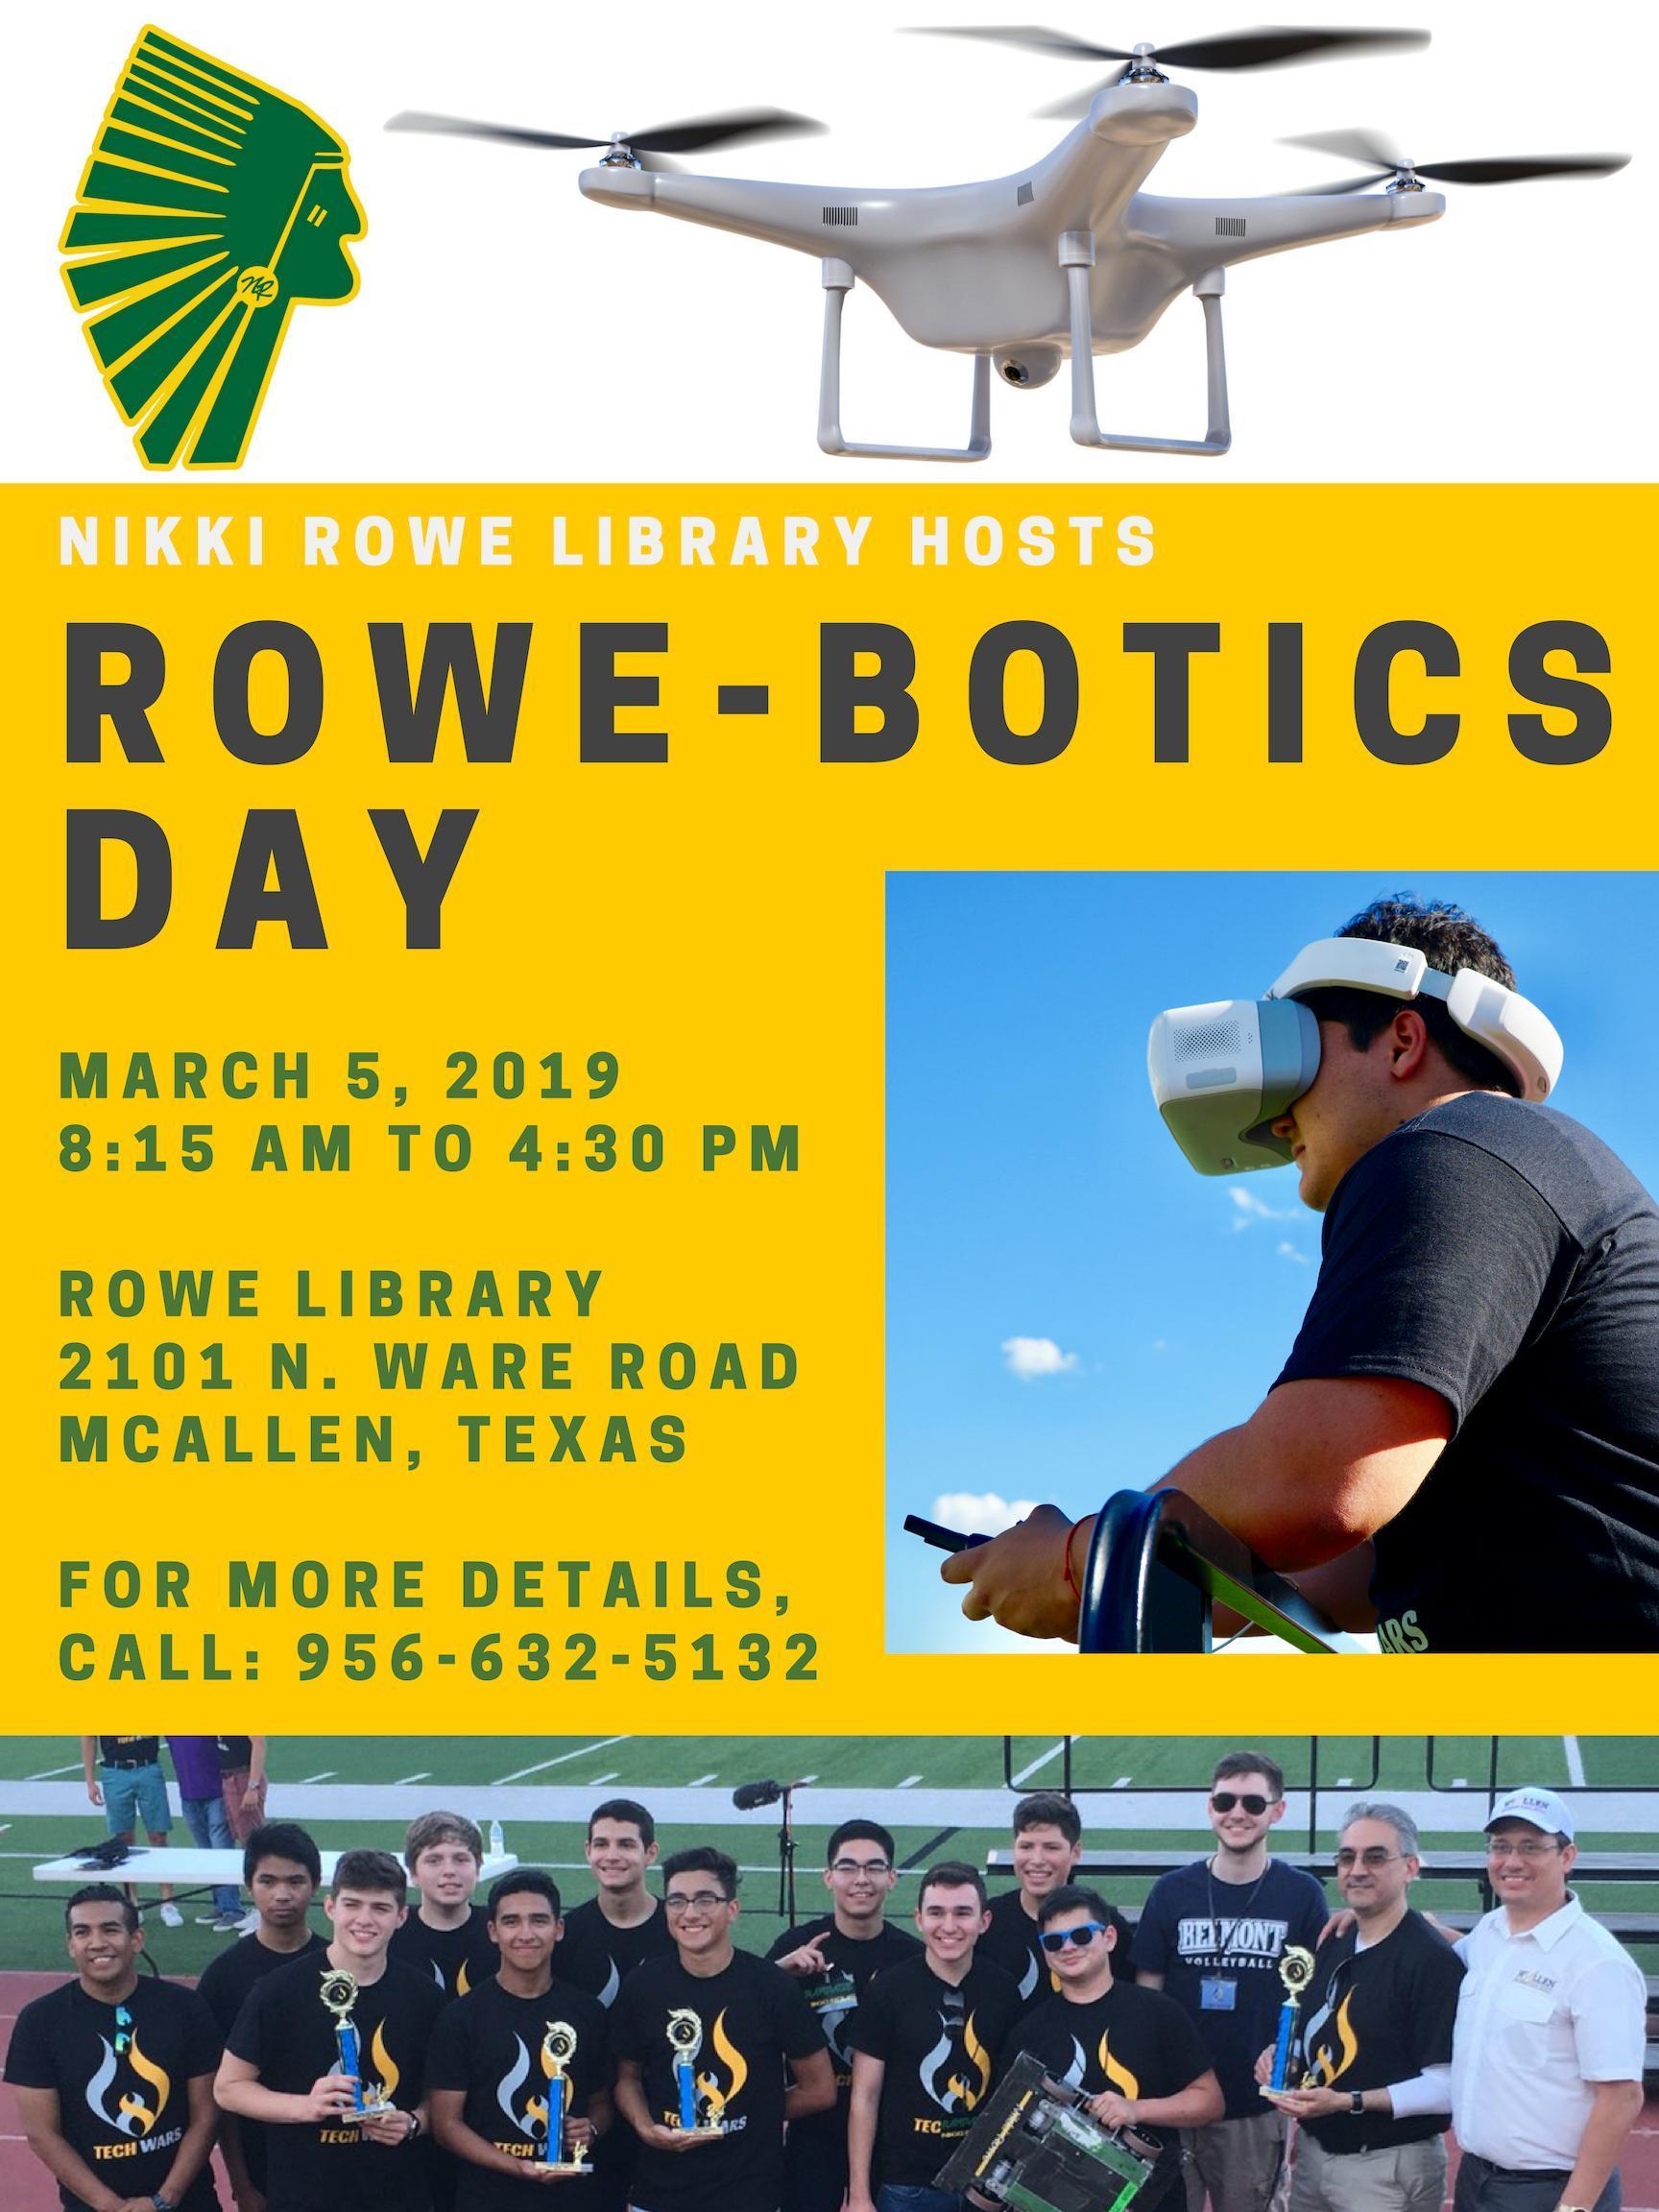 Rowebotic Day